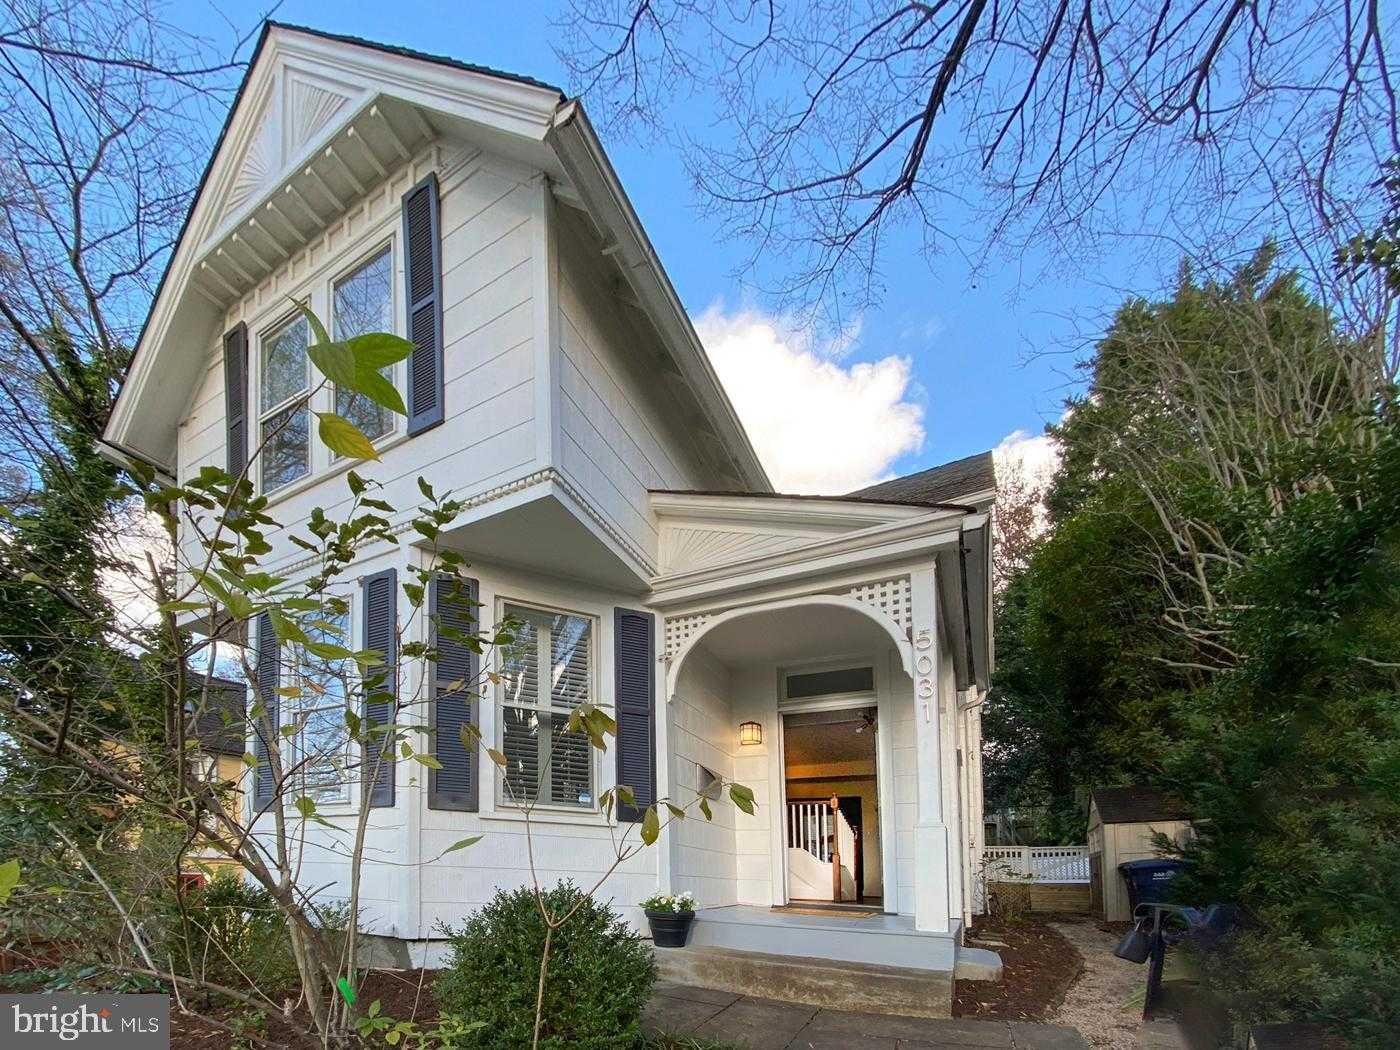 $999,999 - 3Br/2Ba -  for Sale in Kent, Washington